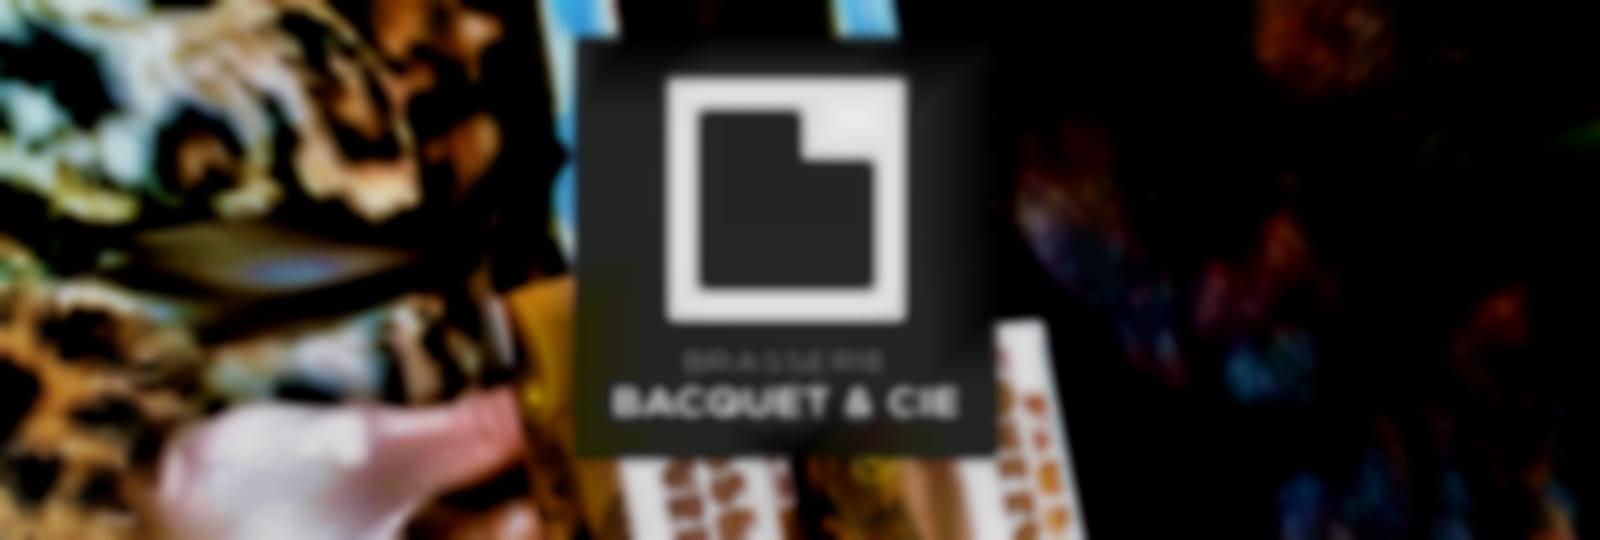 Logo-Brasserie---Copyright-Brasserie-Bacquet